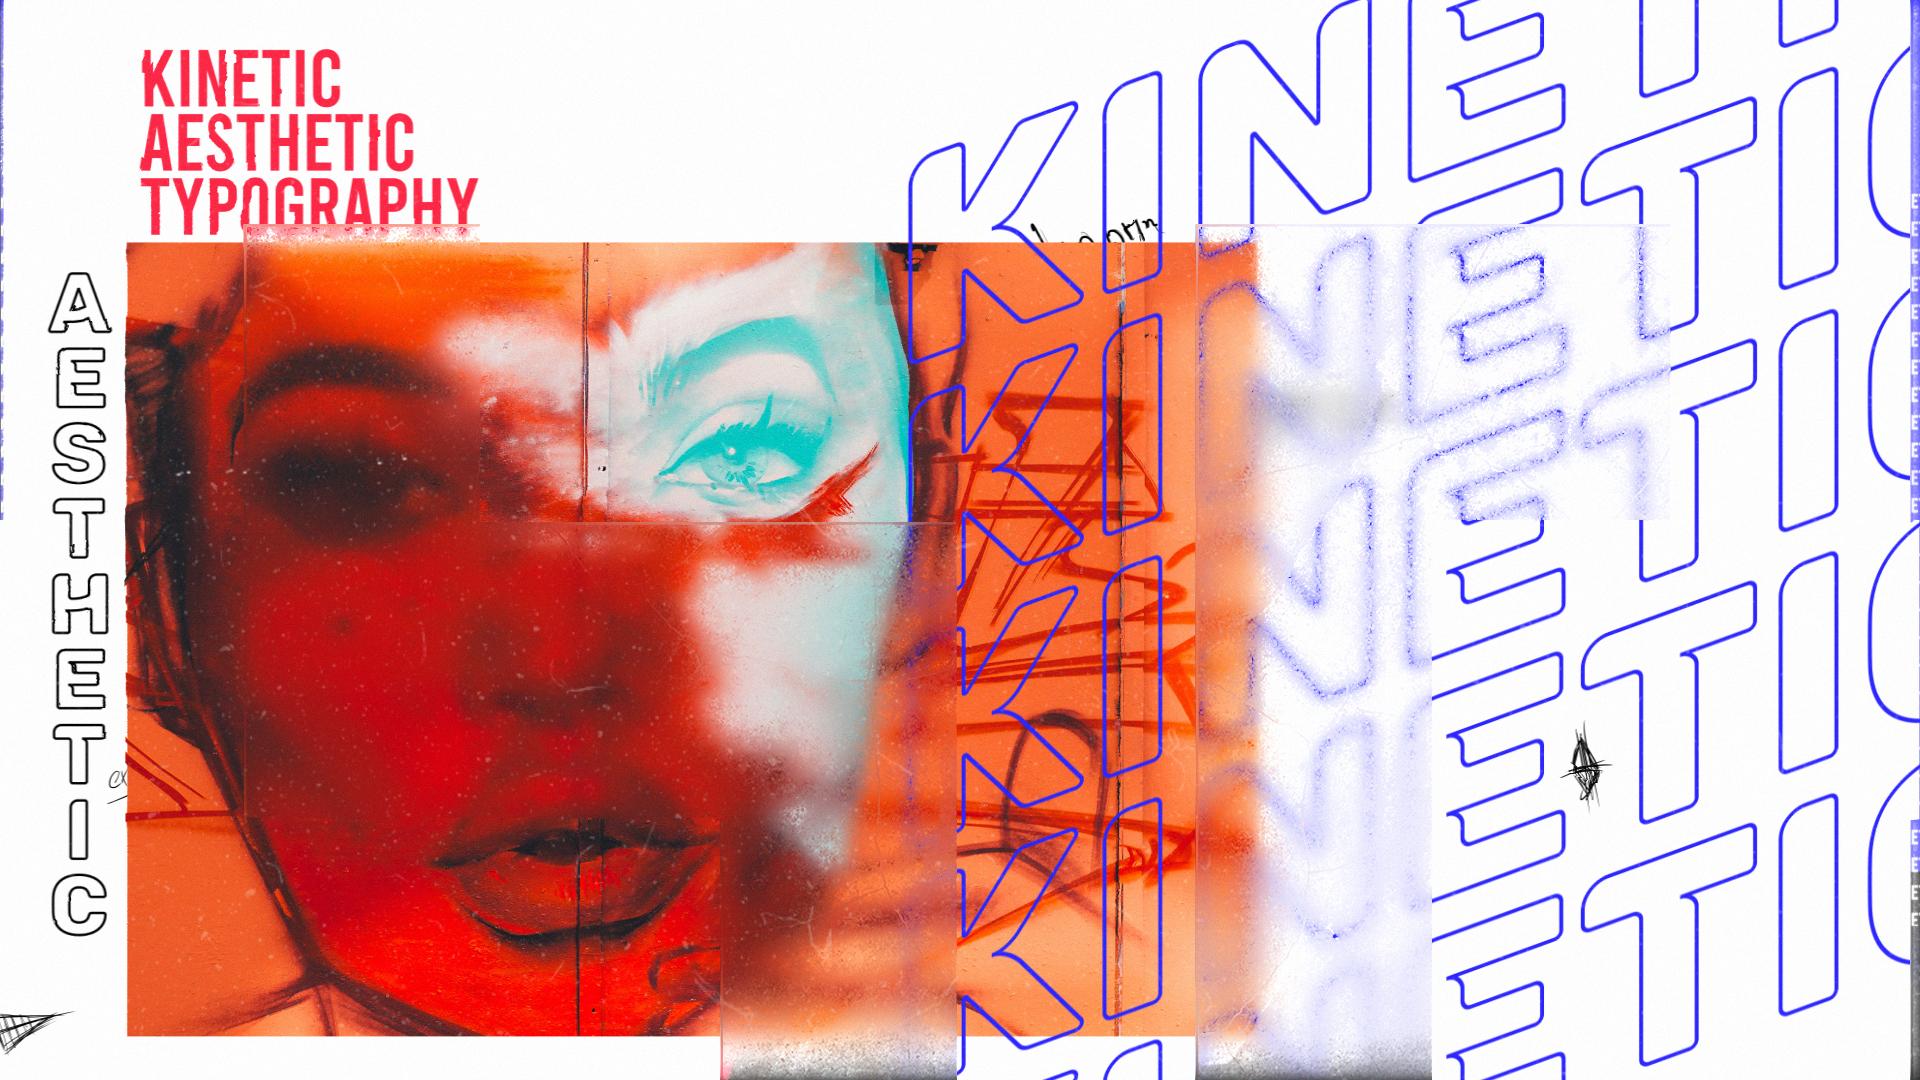 Art of The Title | Kinetic Aesthetic Typography - 4